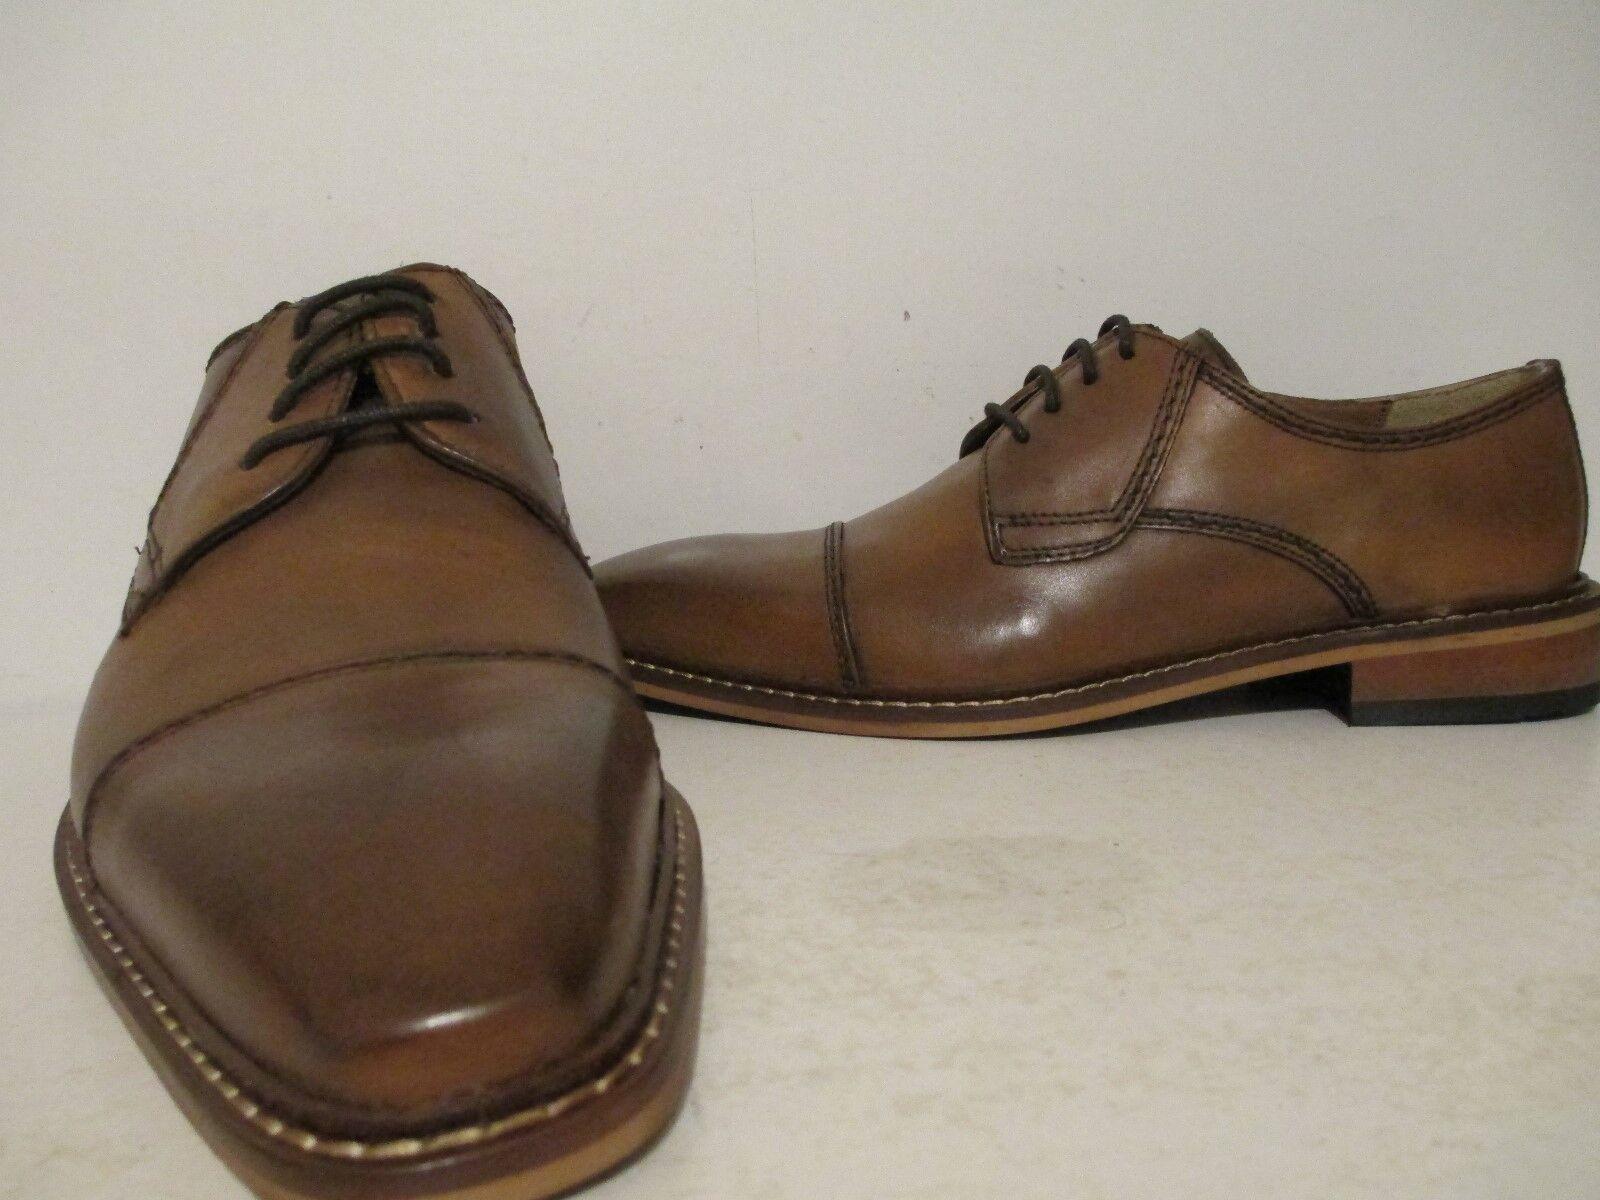 Giorgio Brutini Uomo Revenant 25074 Pelle Oxford Dress Shoe Tan Size 10 M